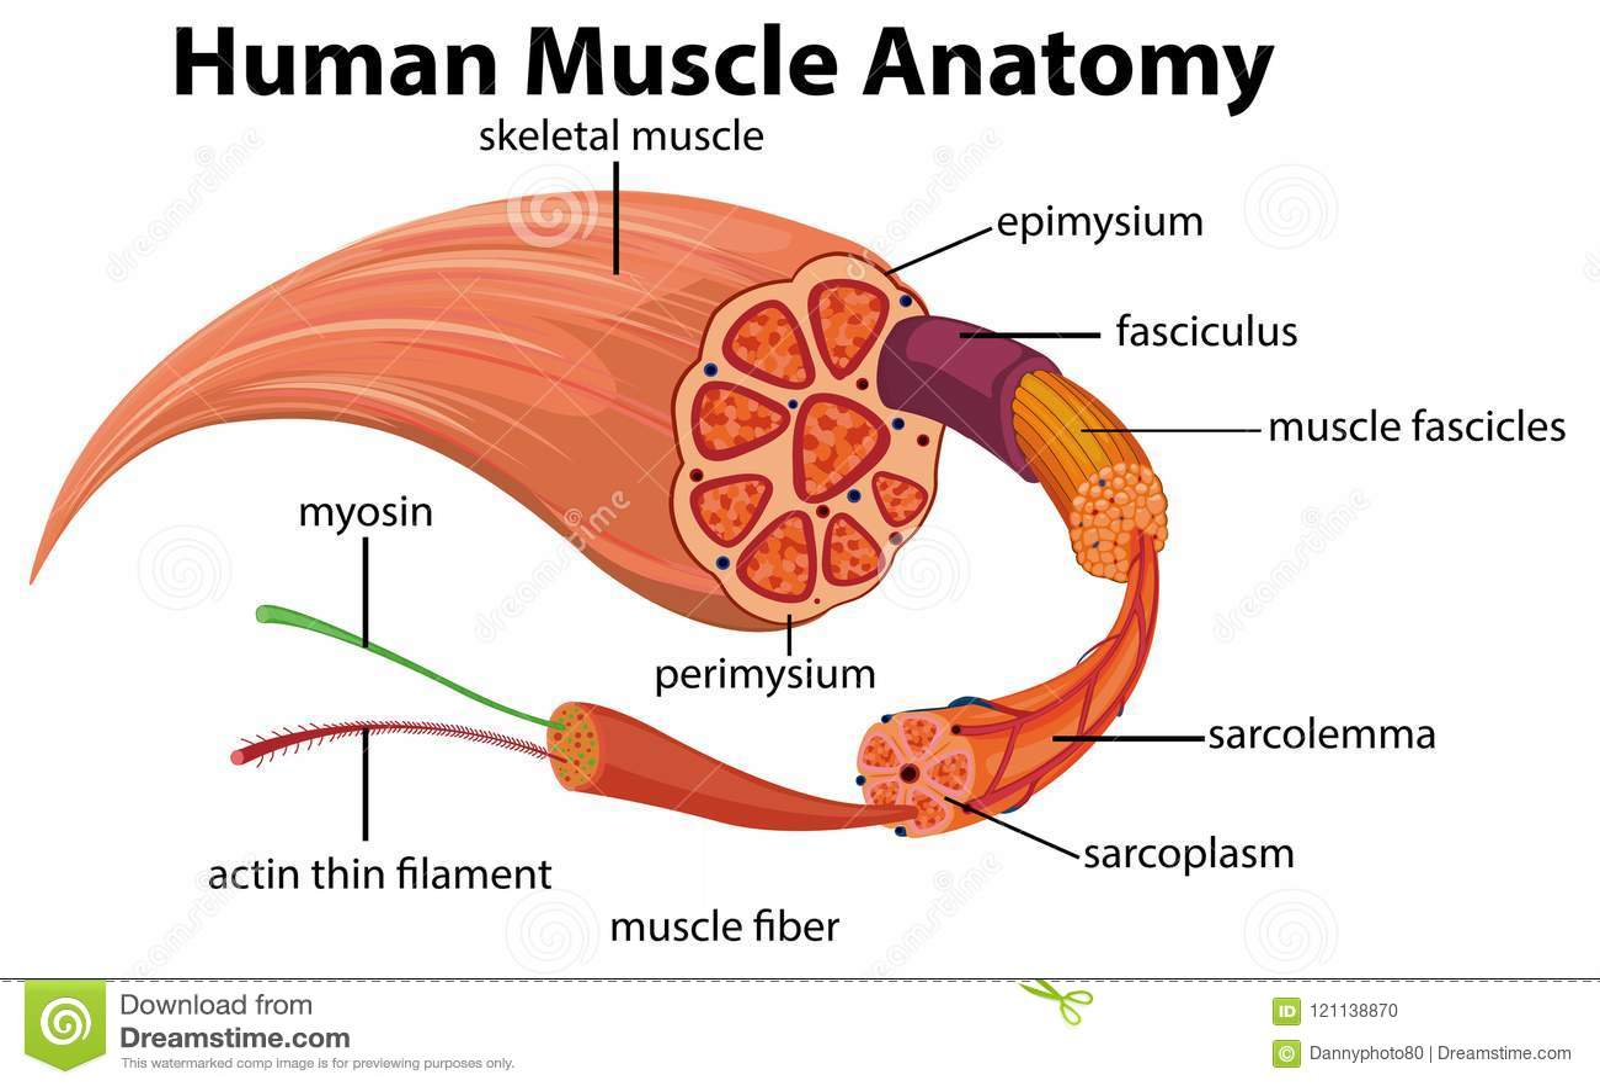 人的肌肉解剖学图